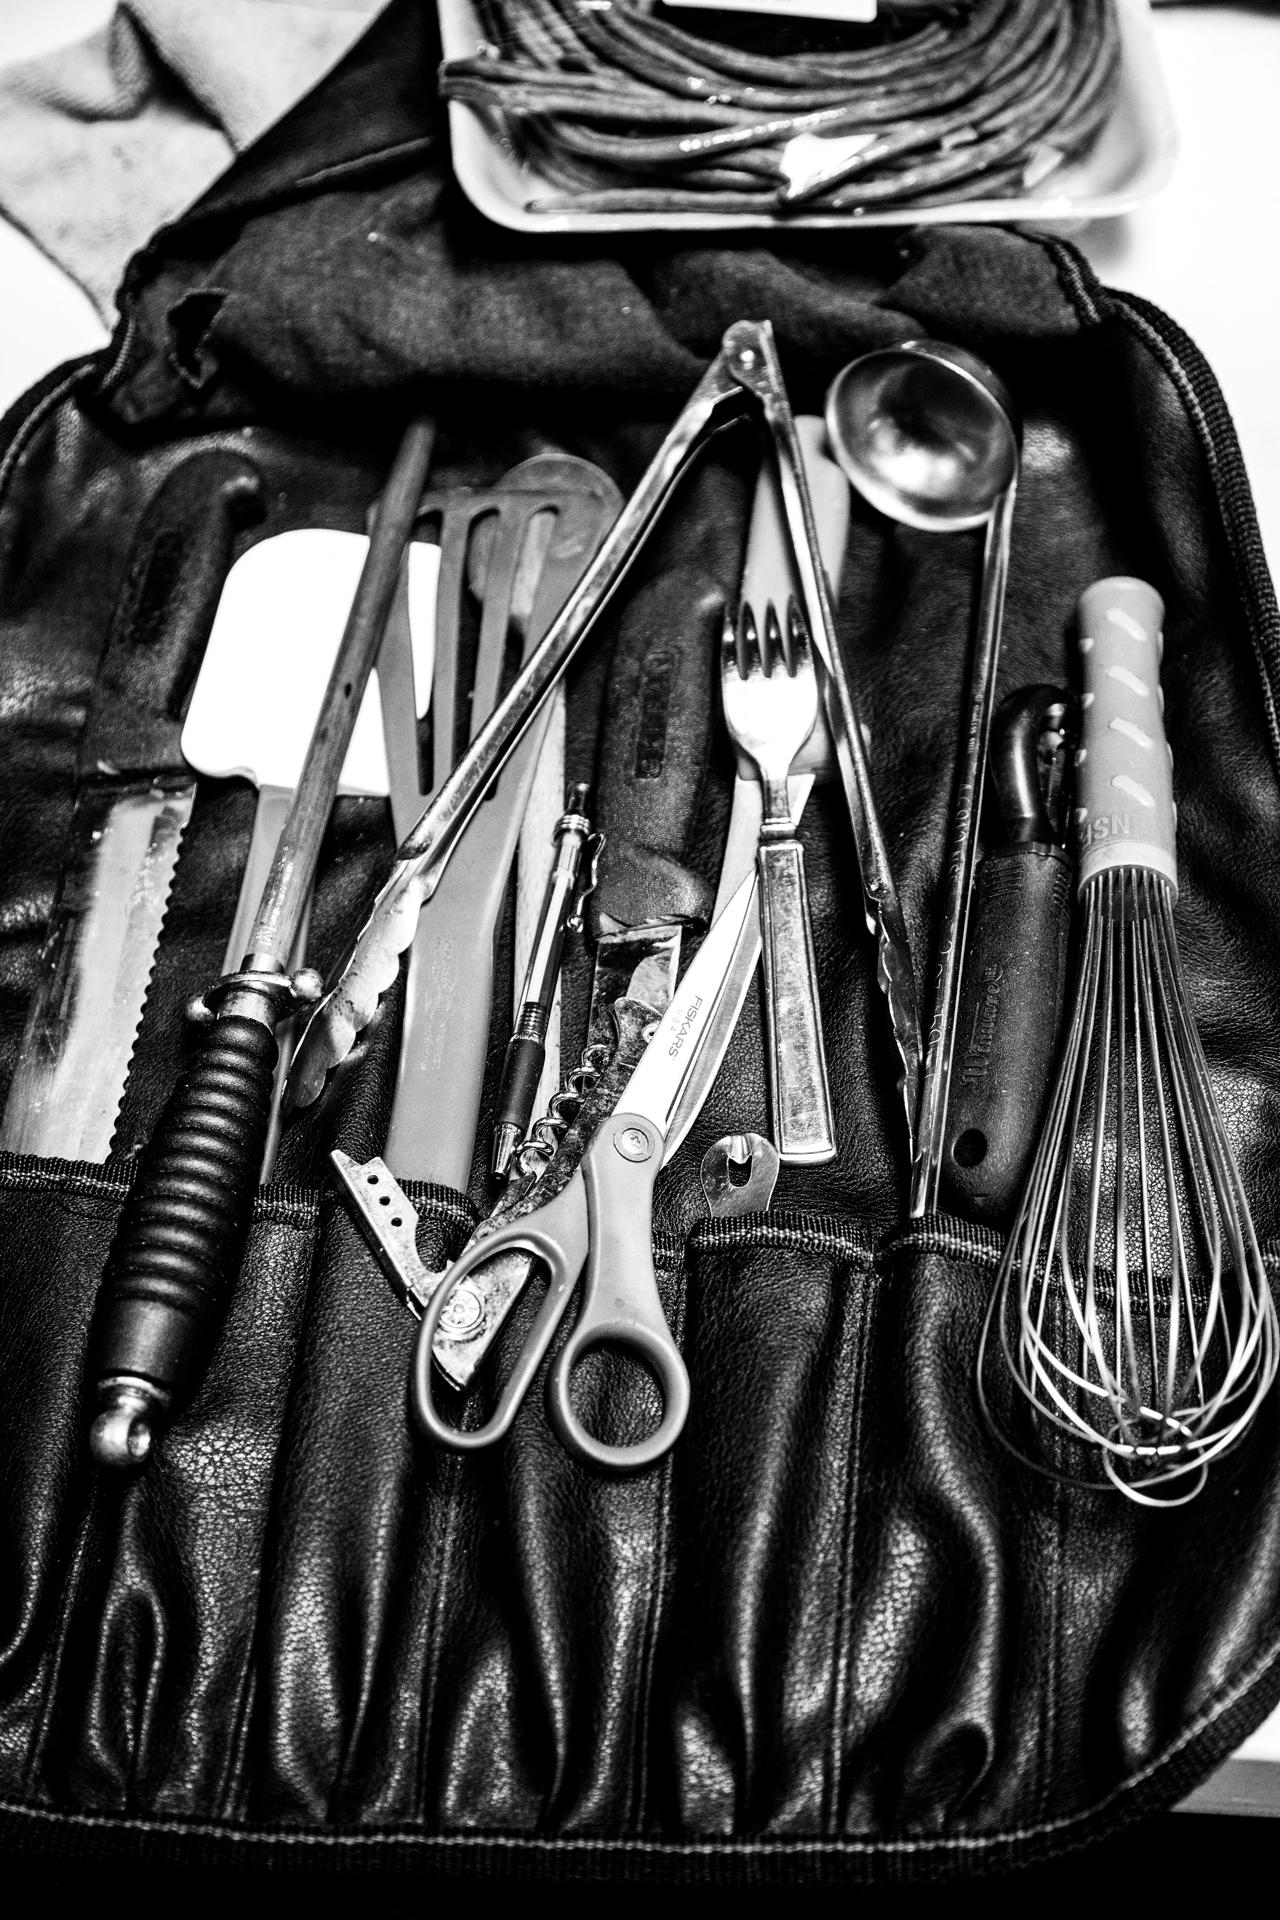 Chef K's Knife Kit